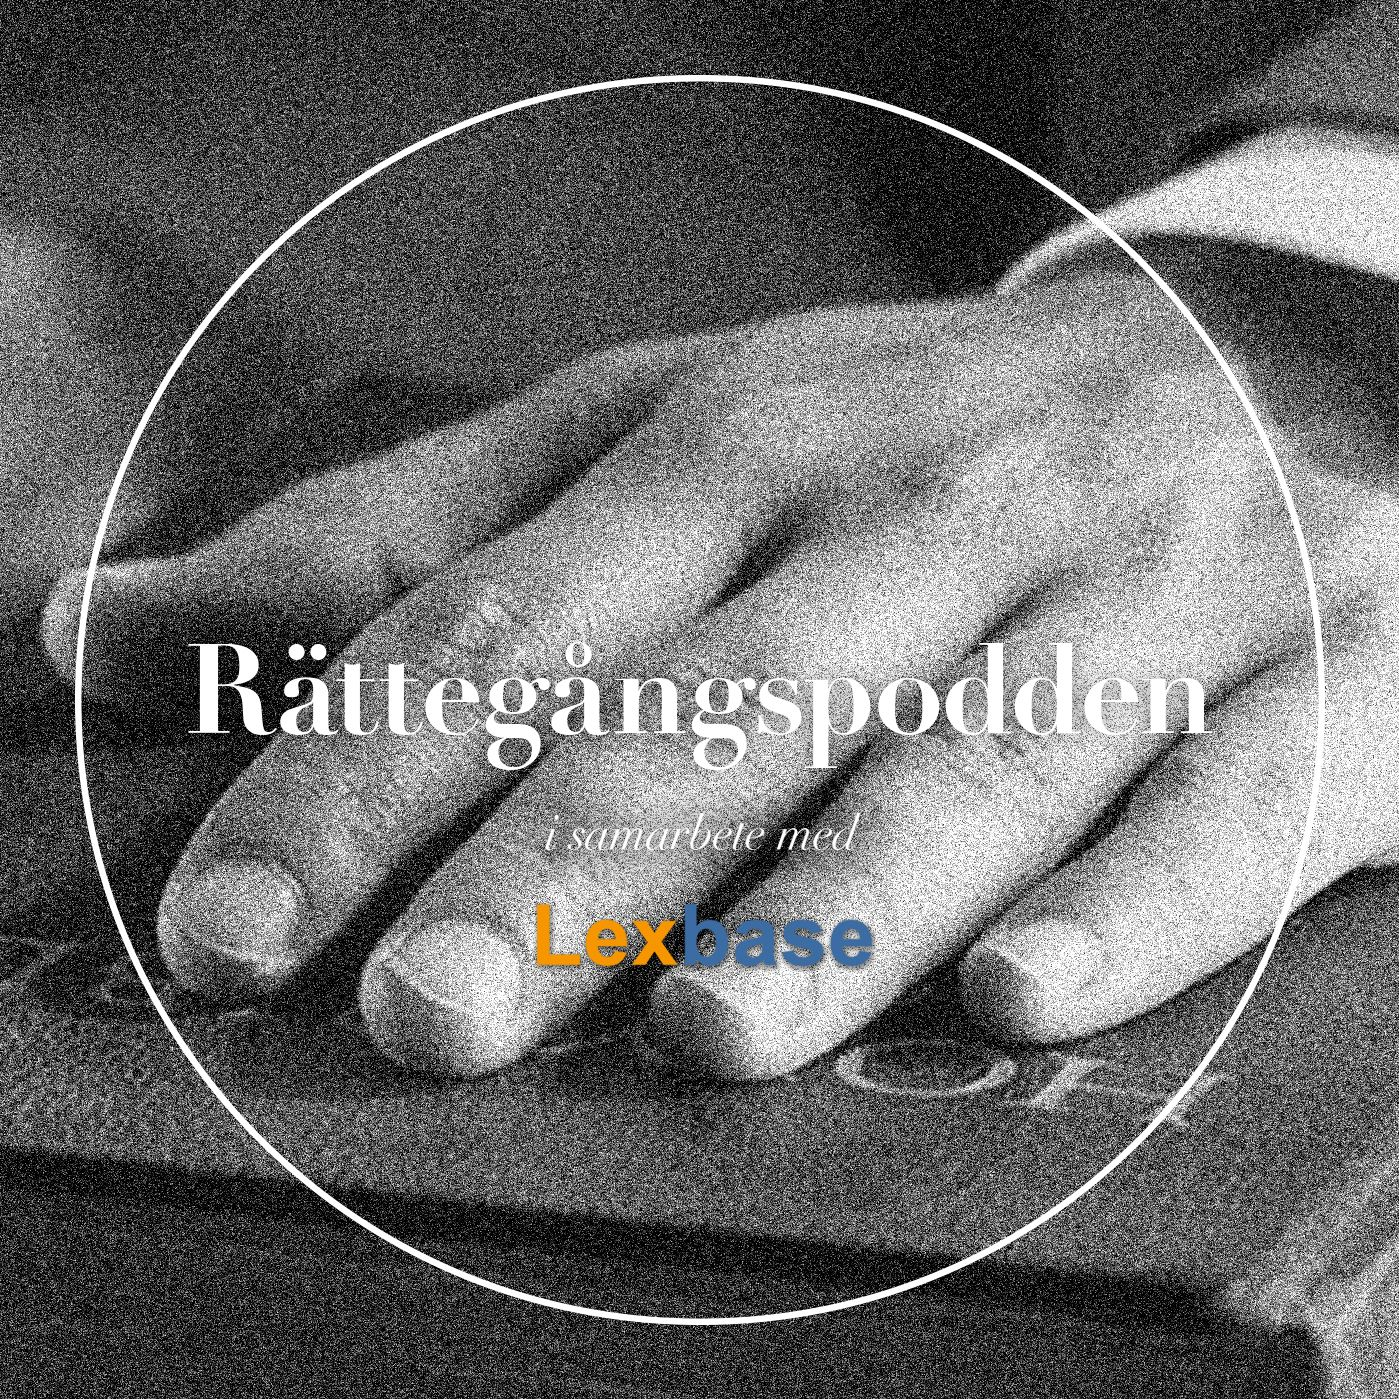 S04E05 Dödsskjutningen i Katrineholm - Del 1/3